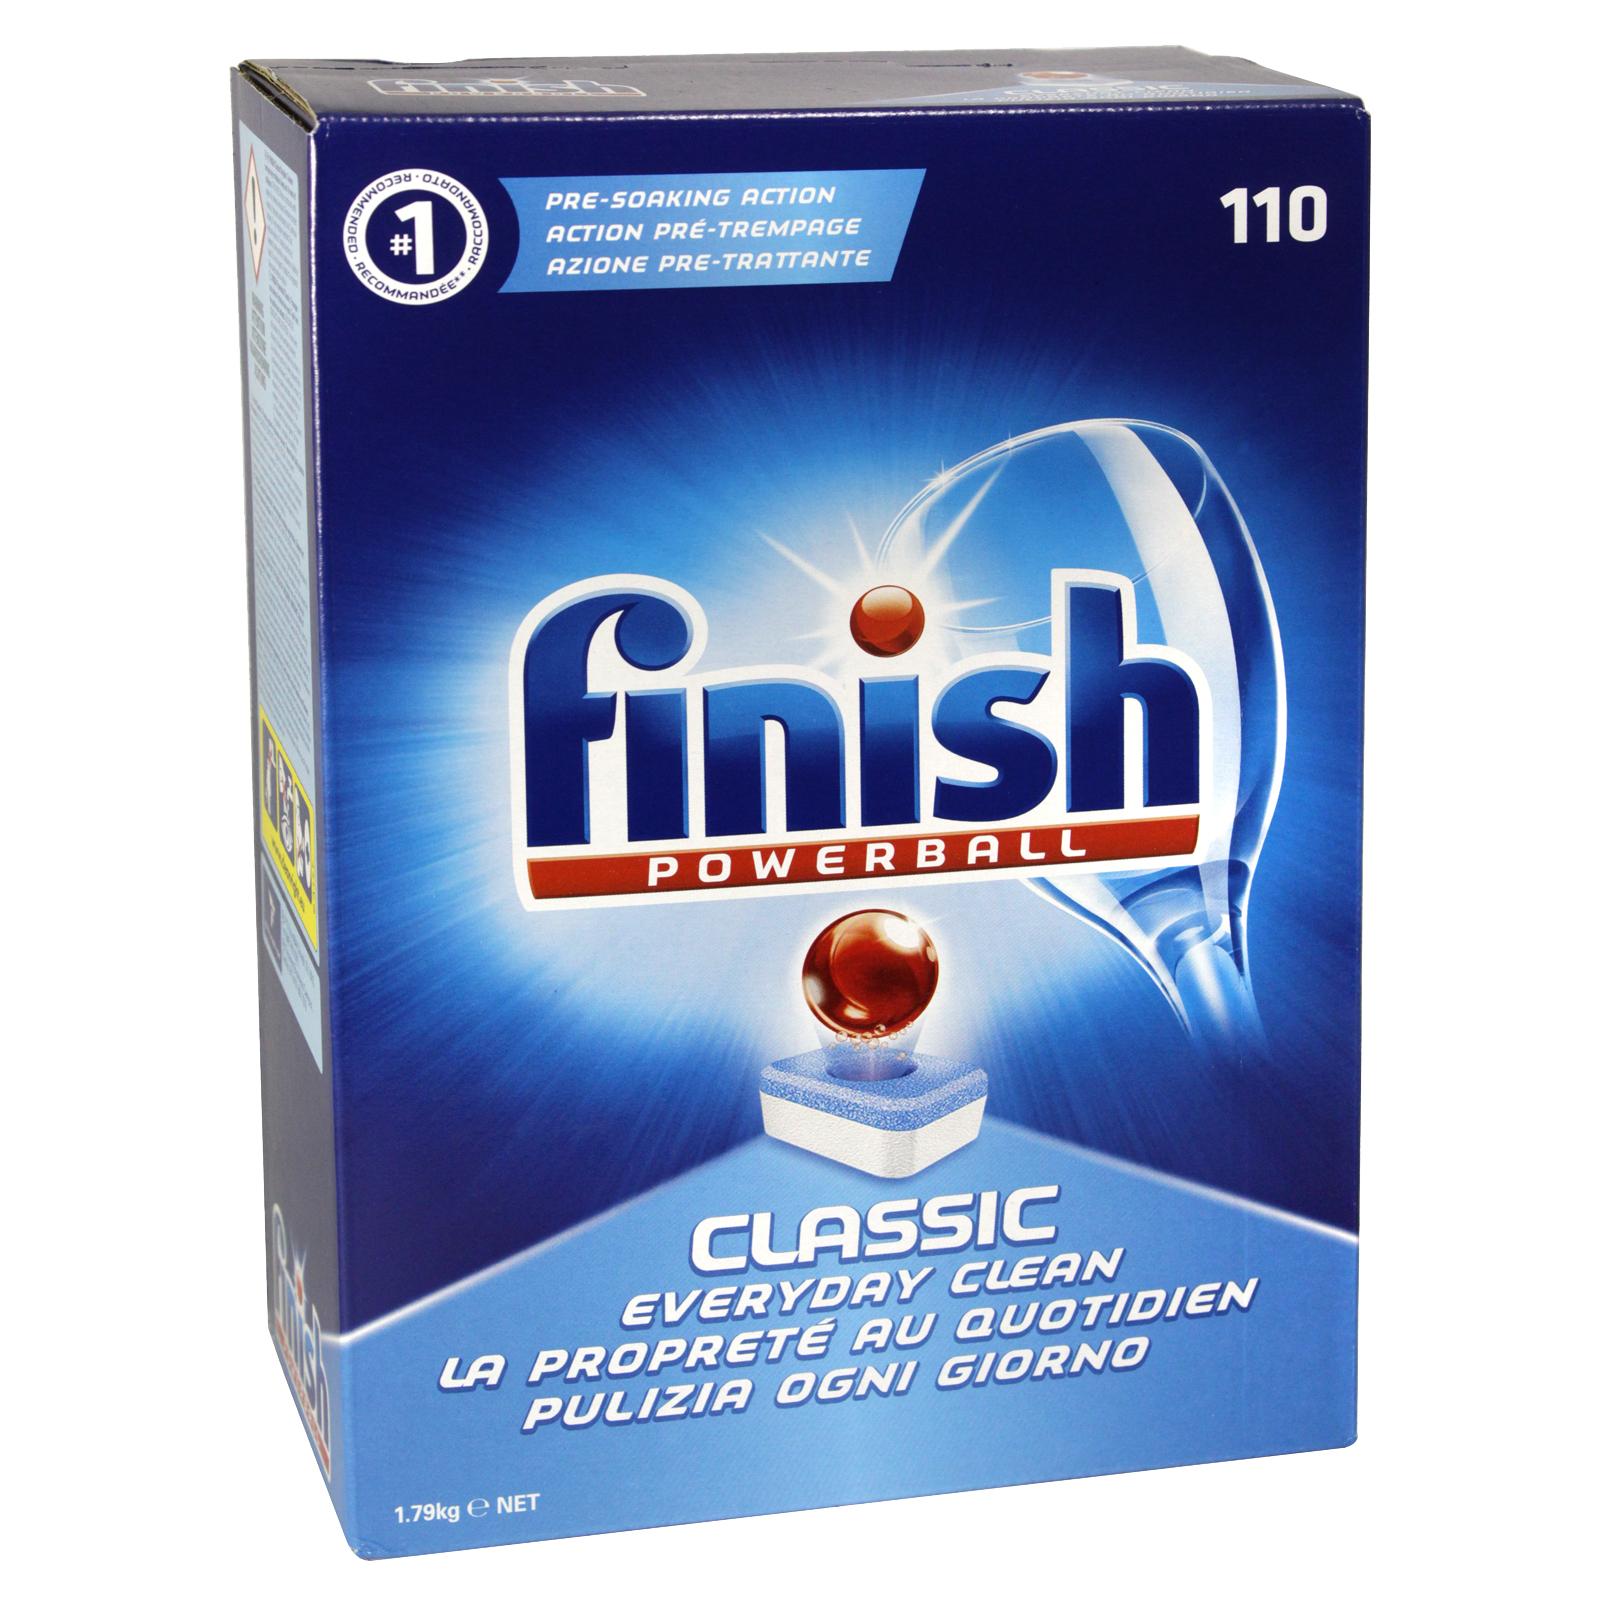 FINISH POWERBALL CLASSIC 110S MEGA